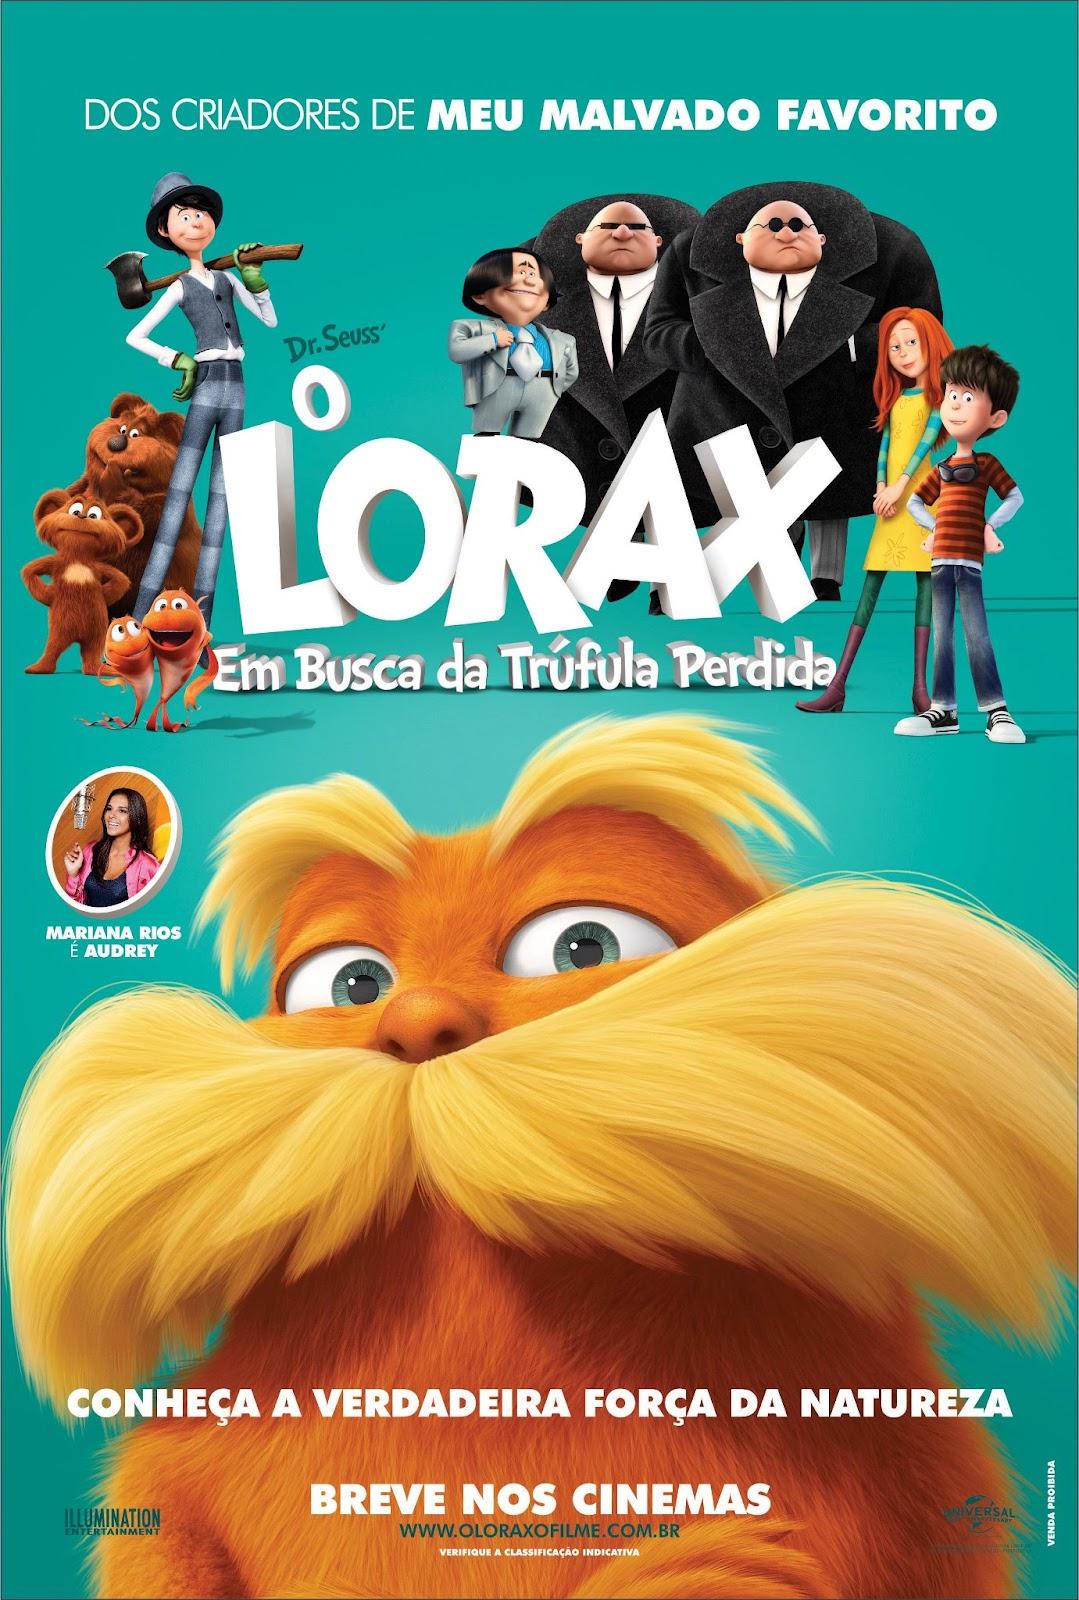 Pôster/capa/cartaz nacional de O LORAX: EM BÚSCA DA TRUFULA PERDIDA (The Lorax)